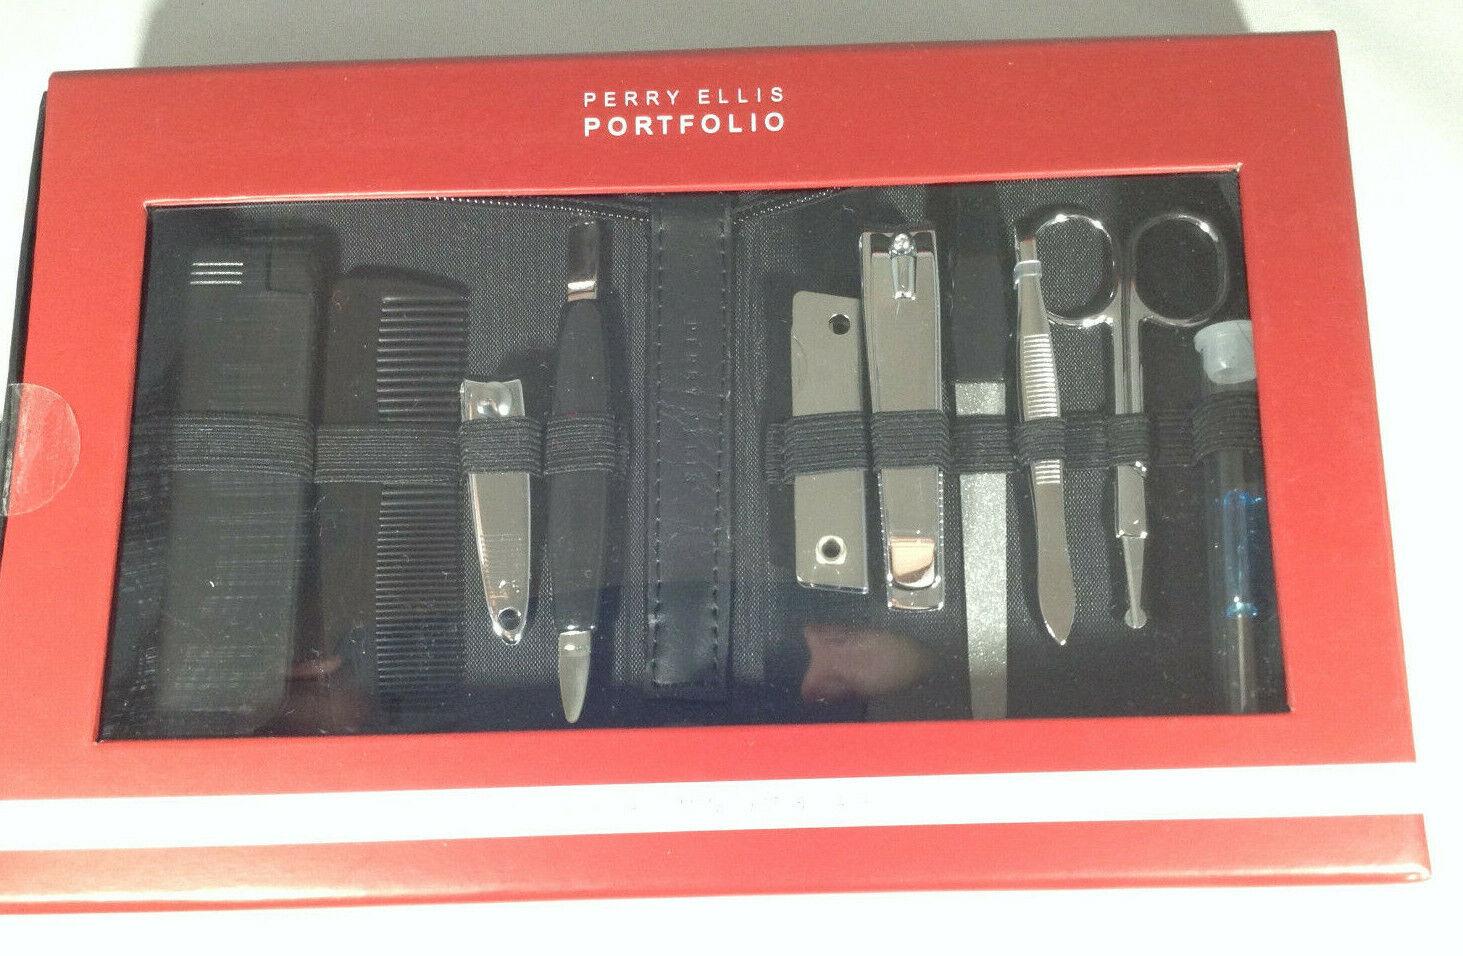 New Perry Ellis Portfolio 10 piece Grooming Set & Case